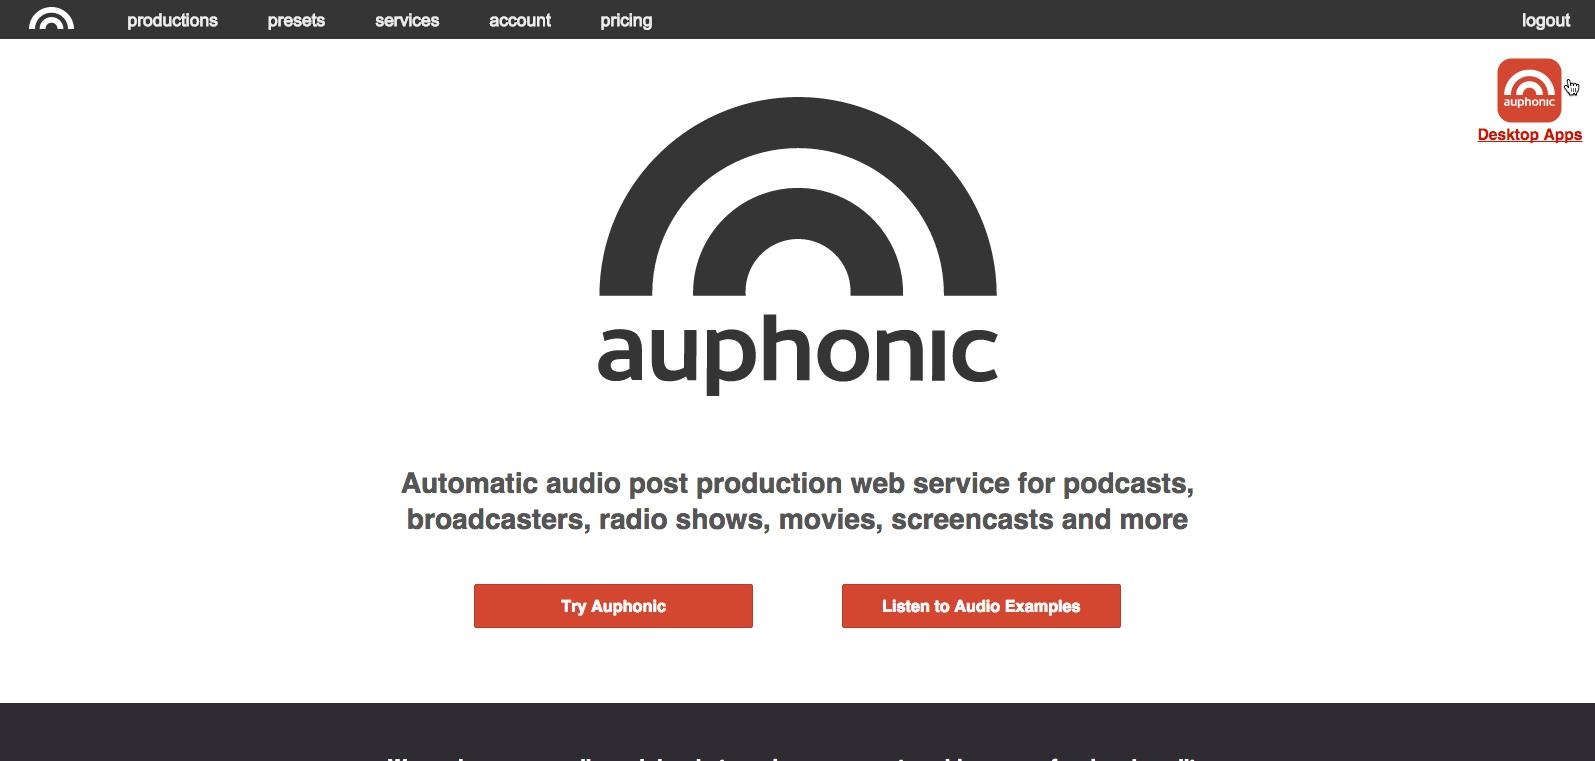 Auphonic-31